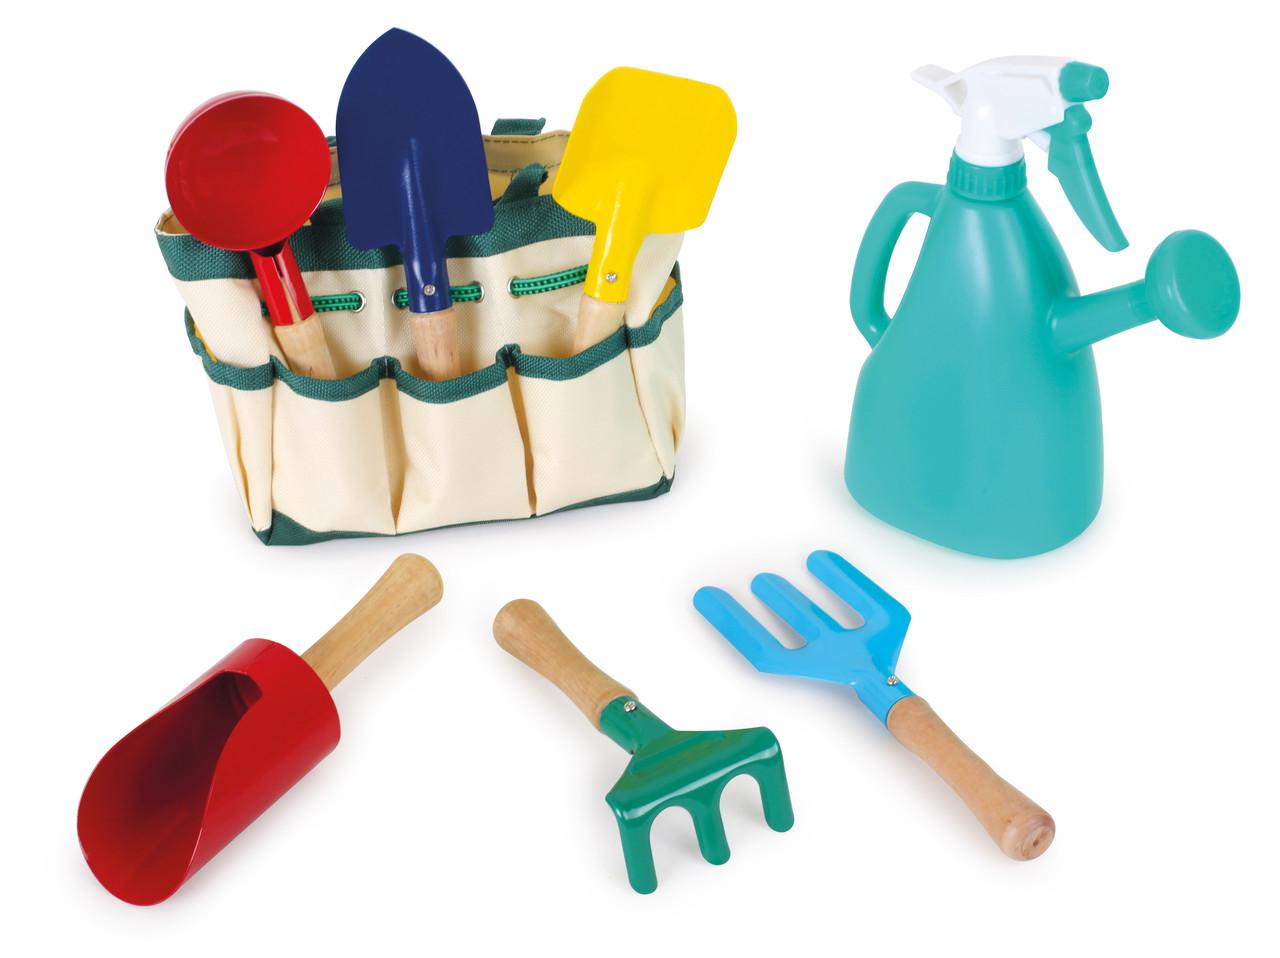 Sandspielzeug happylino for Utensilios de jardineria